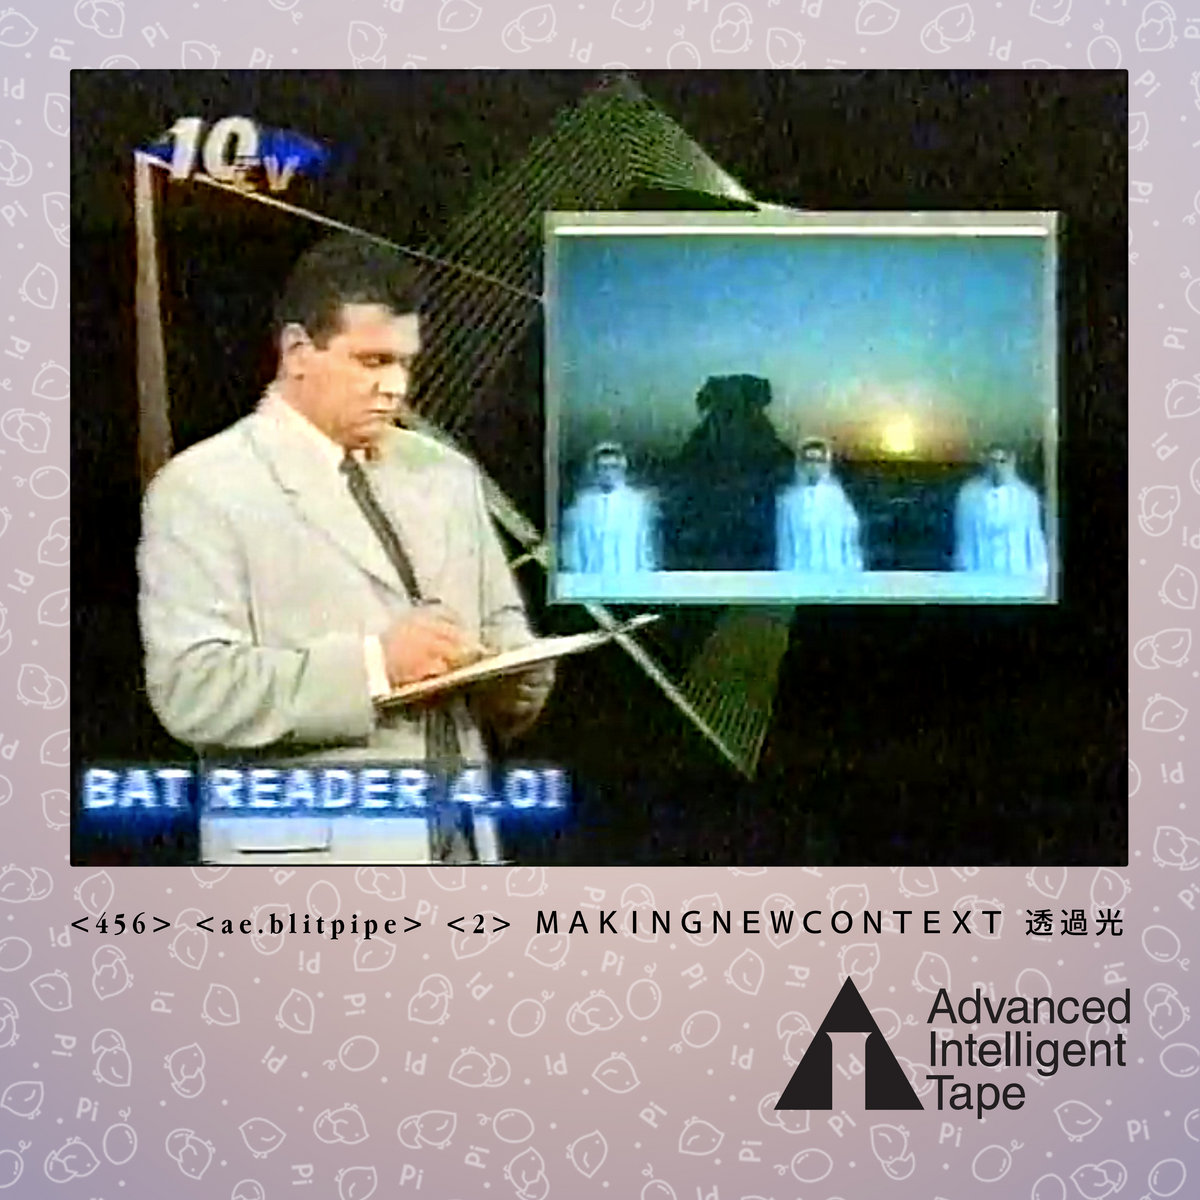 "MakingNewContext 透過光 ""🦇 𝔅𝔞𝔱 ℜ𝔢𝔞𝔡𝔢𝔯 4.01 🦇"""